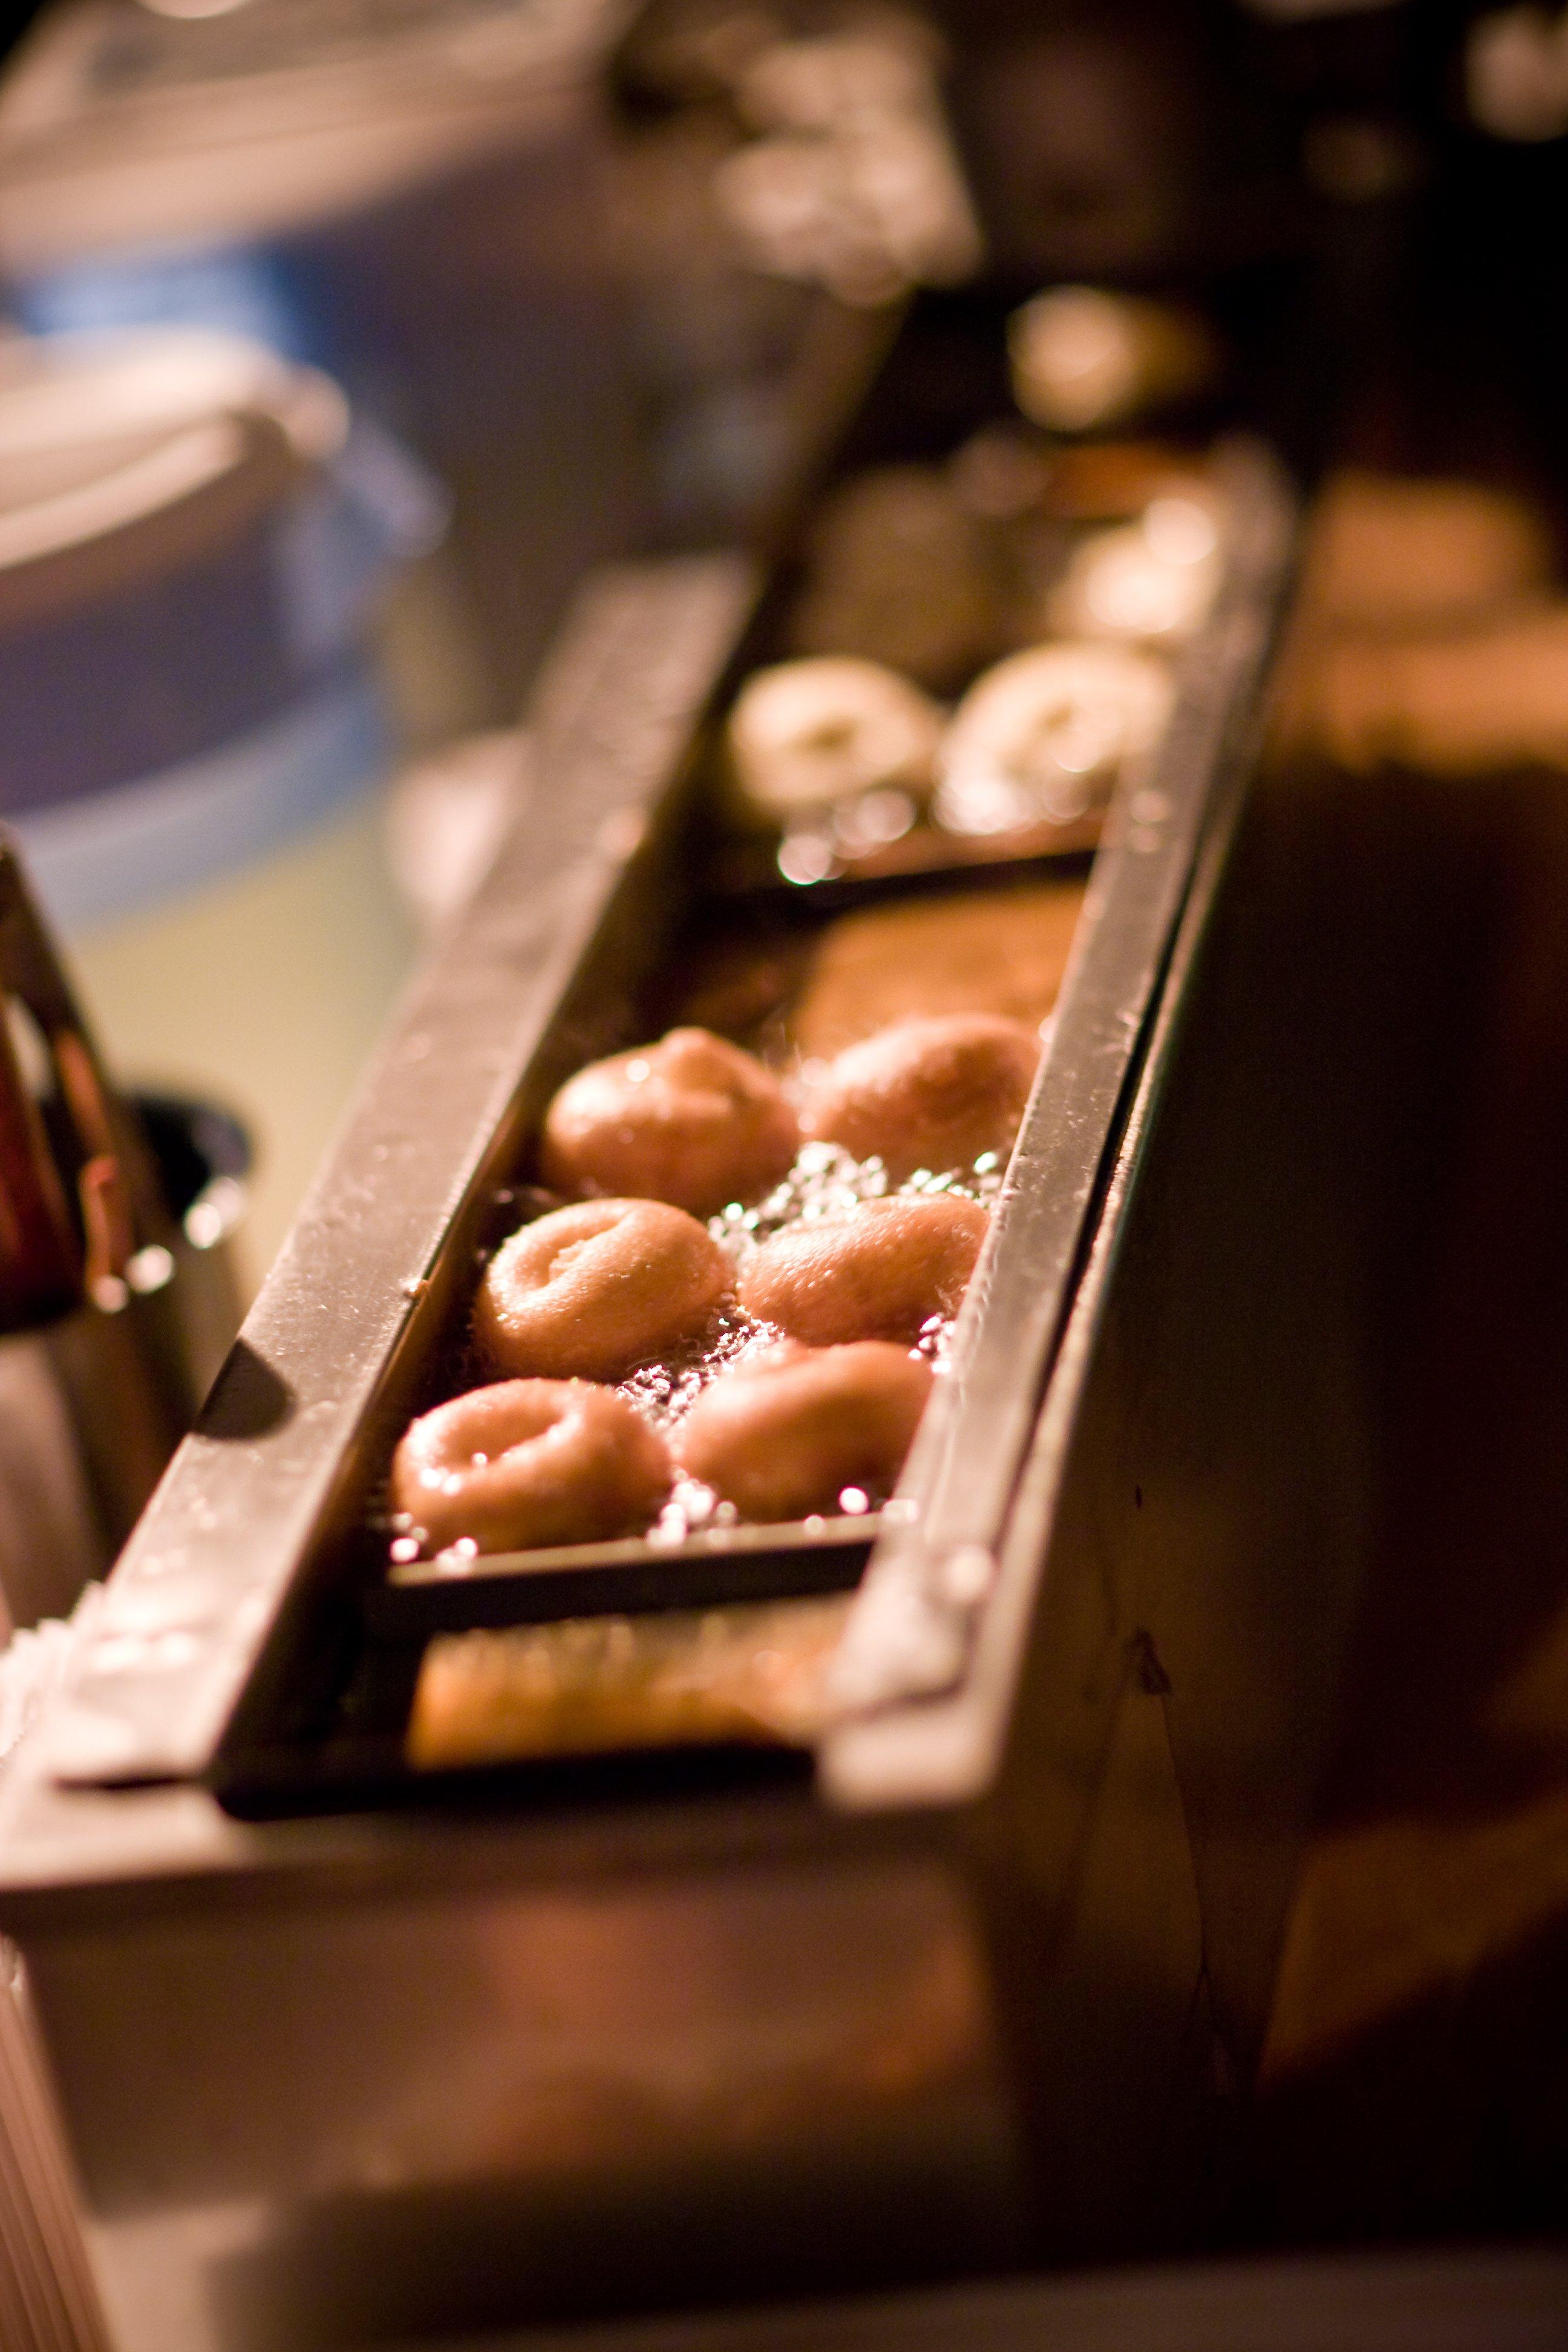 National donut day fresh donuts at wedding reception doughnut dessert ideas